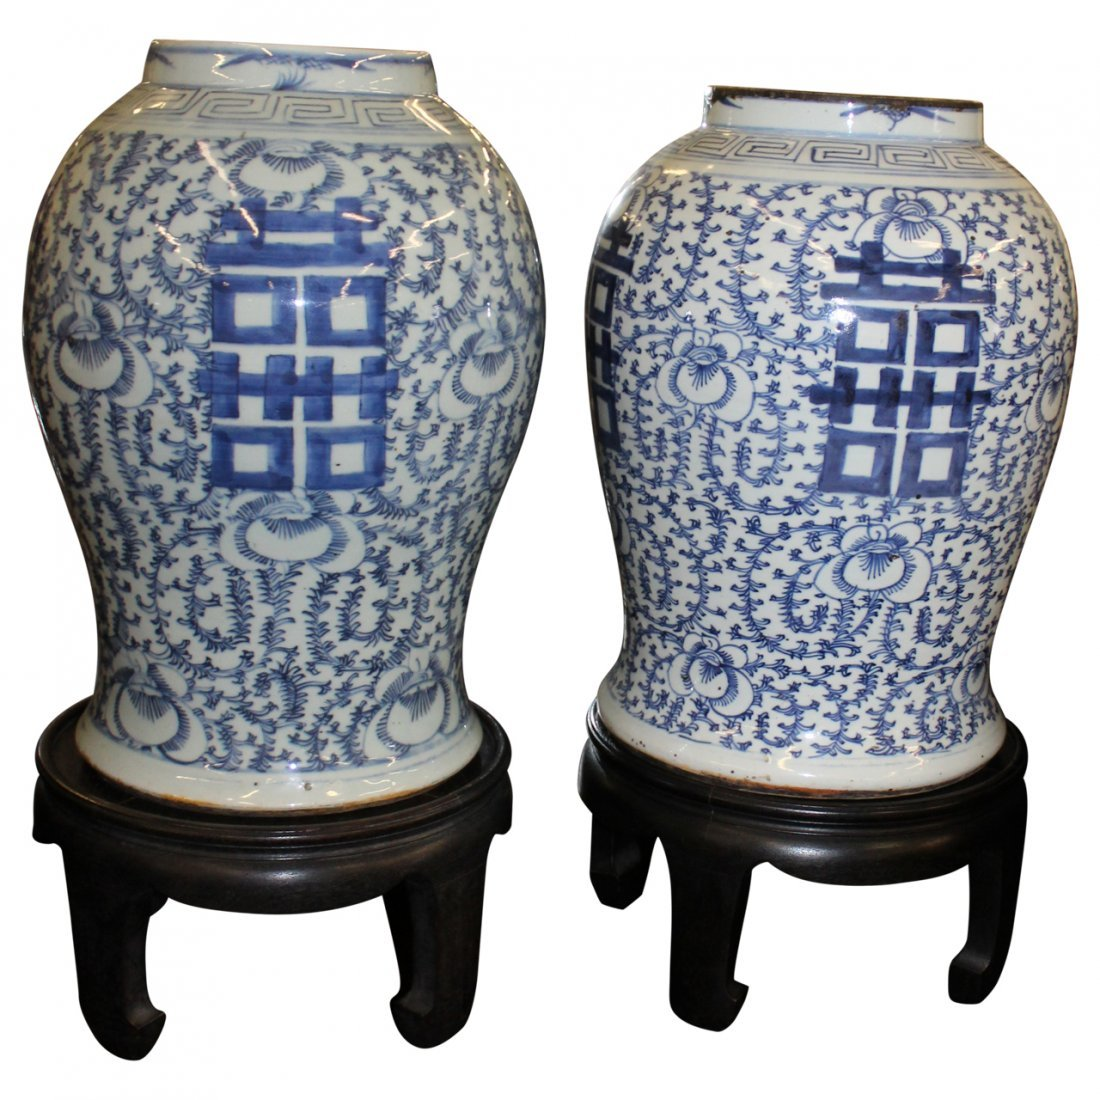 Pair of Asian Urns - 2